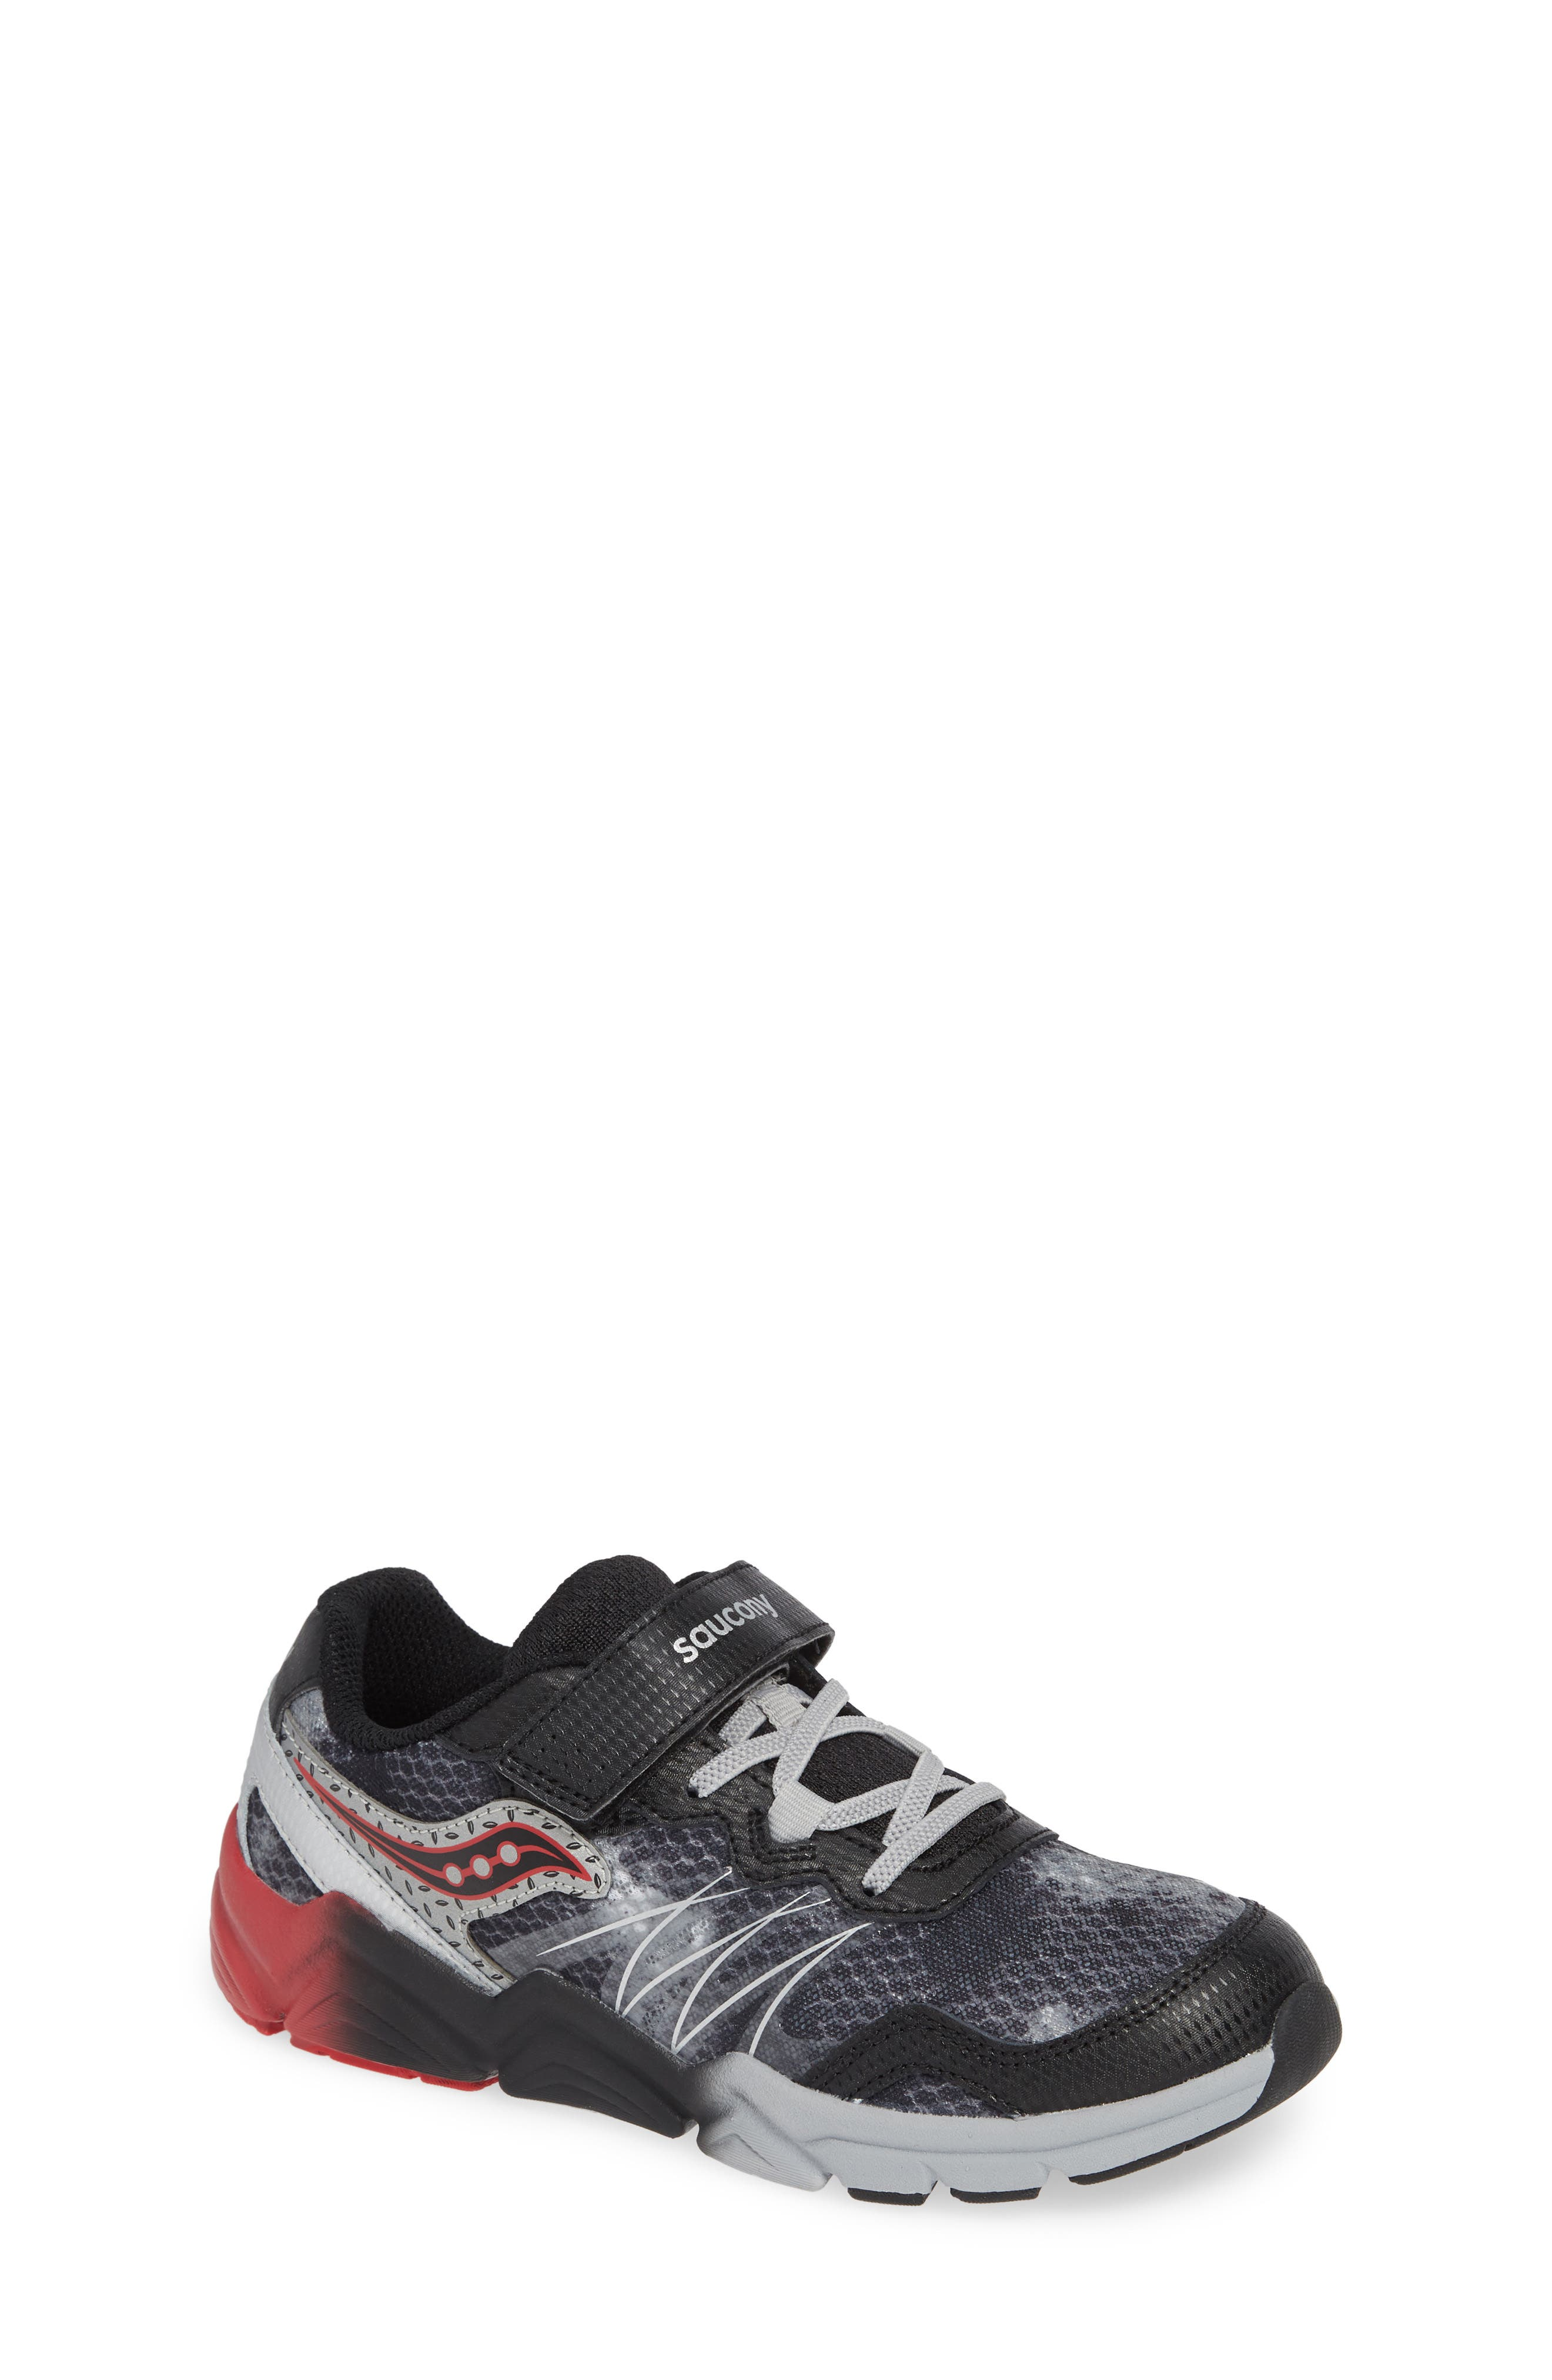 Kotaro Flash Sneaker,                         Main,                         color, BLACK LEATHER/ MESH